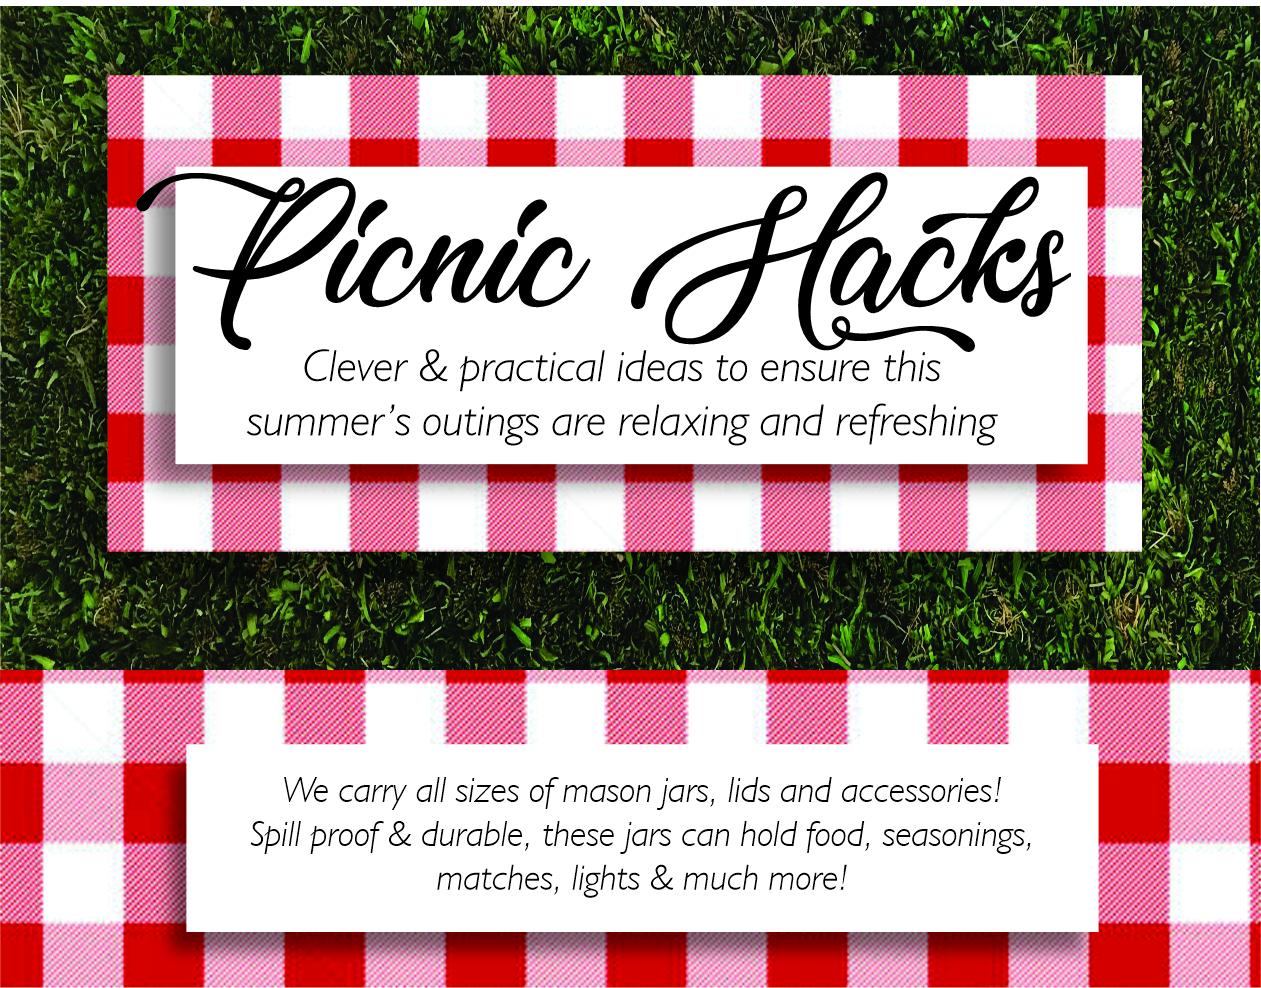 Picnic Hacks Ad p1.jpg